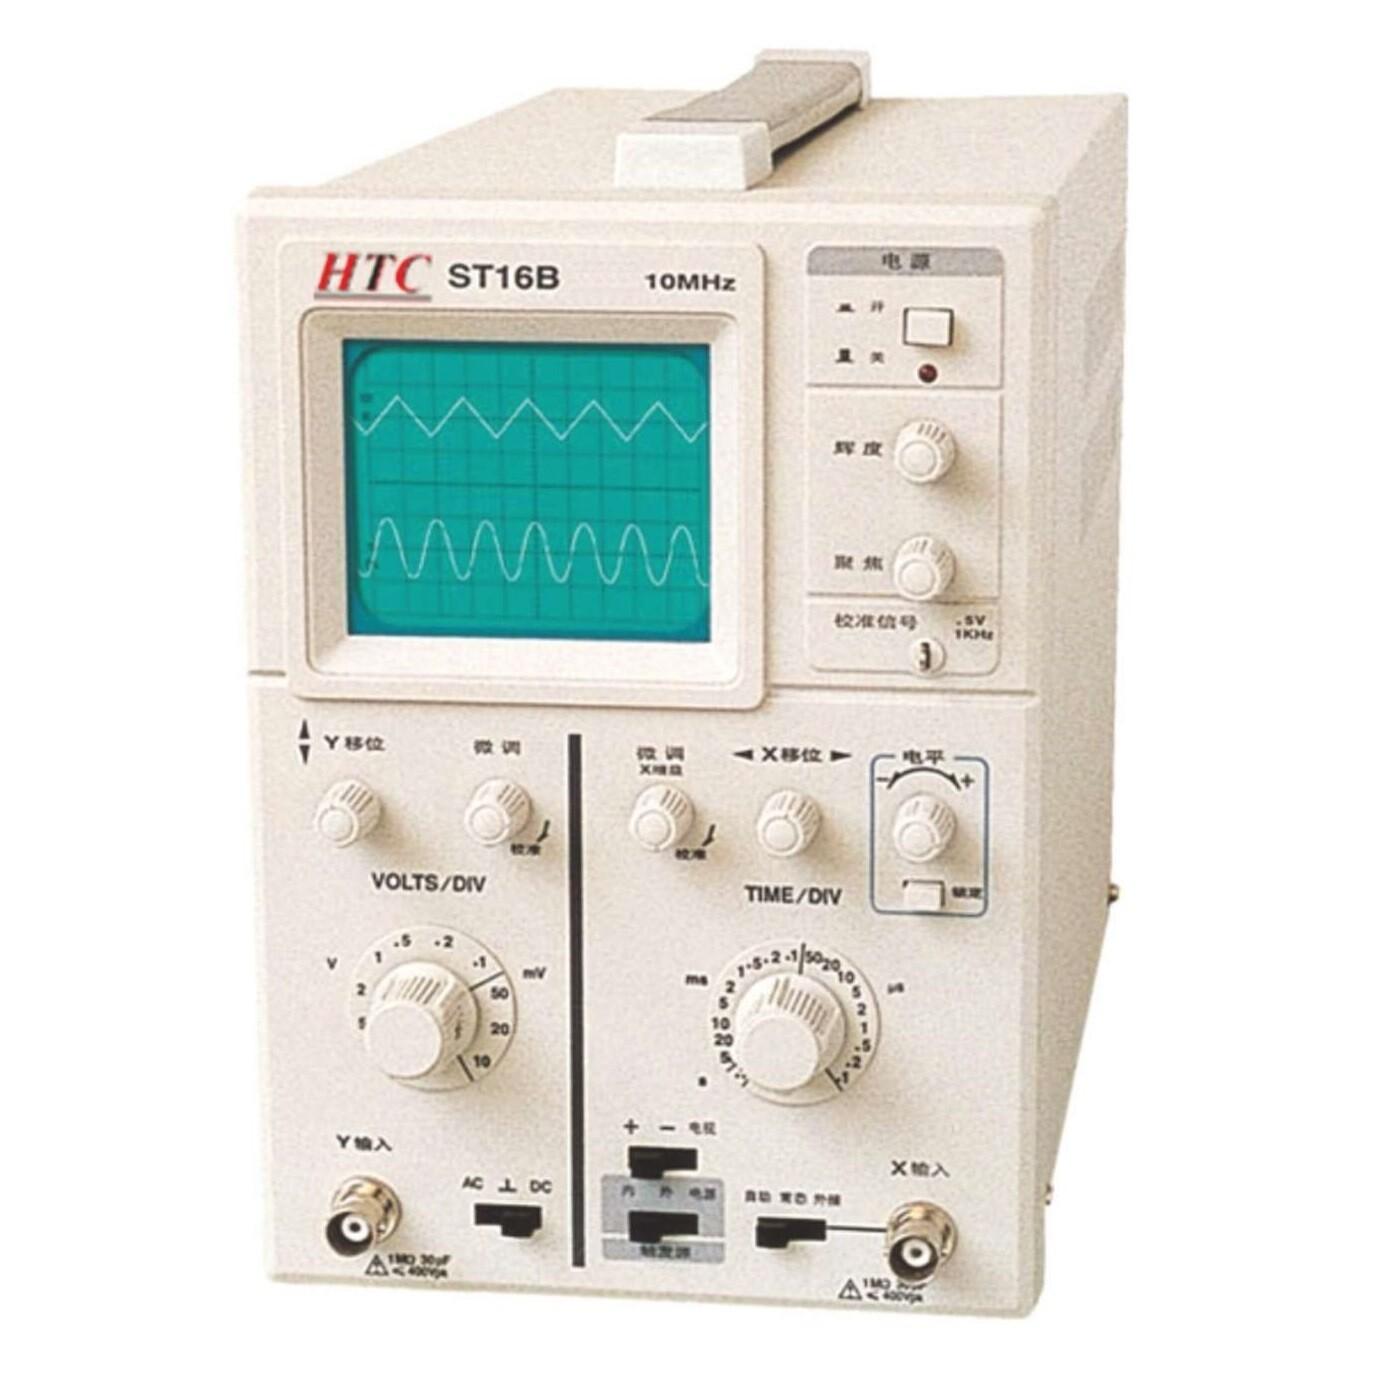 HTC ST16B 10MHz Cathode Ray Oscilloscope